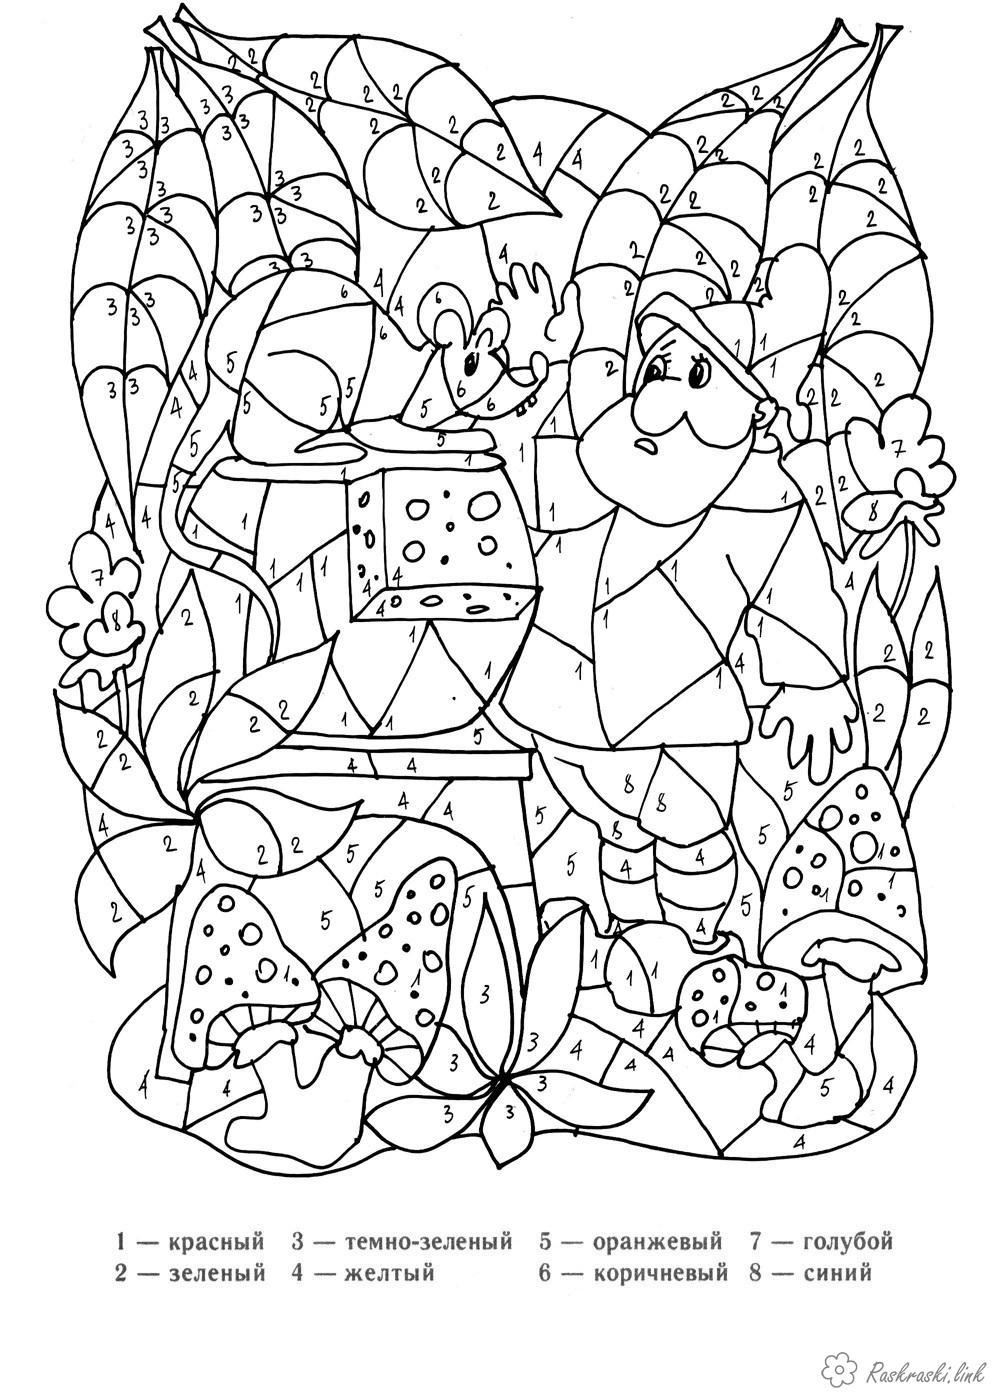 Розмальовки Розмальовки за номерами розмальовки для дітей, розмальовки за номерами